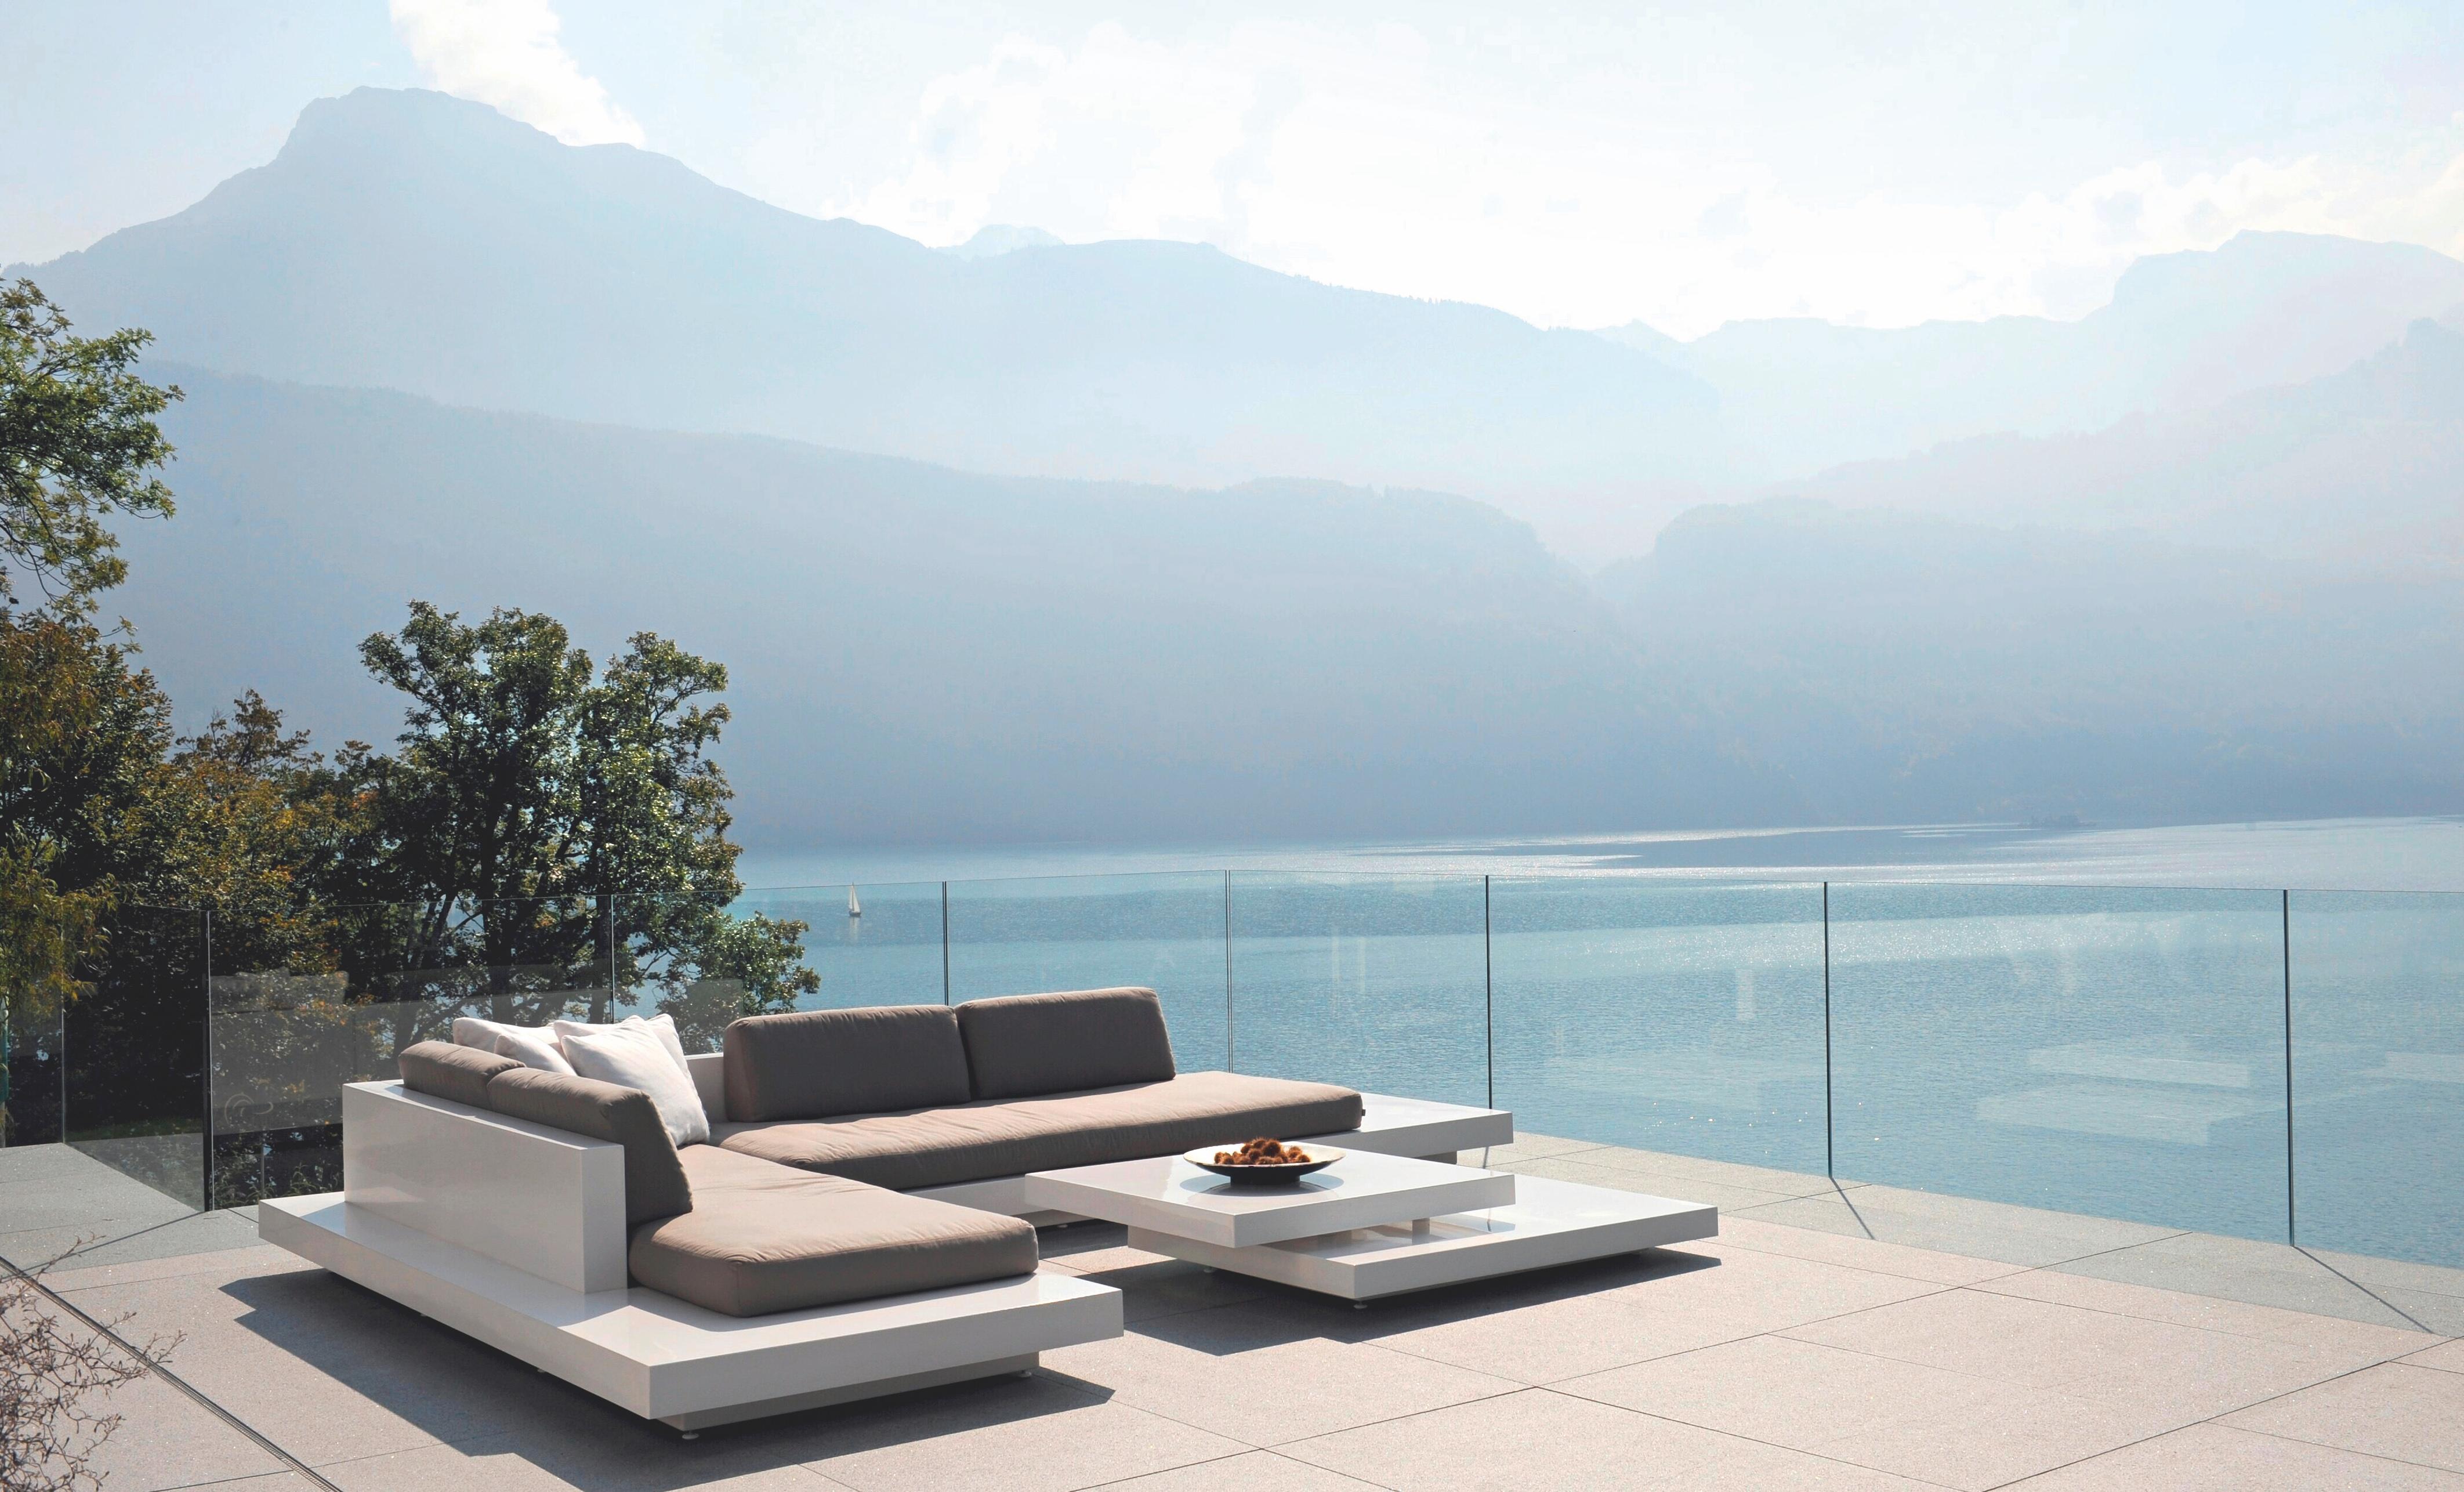 Platform Modules PiecesPlatform Combinations Modern Sectional Platform Sofa  With Sleek Lines And Amazing Angles Make For